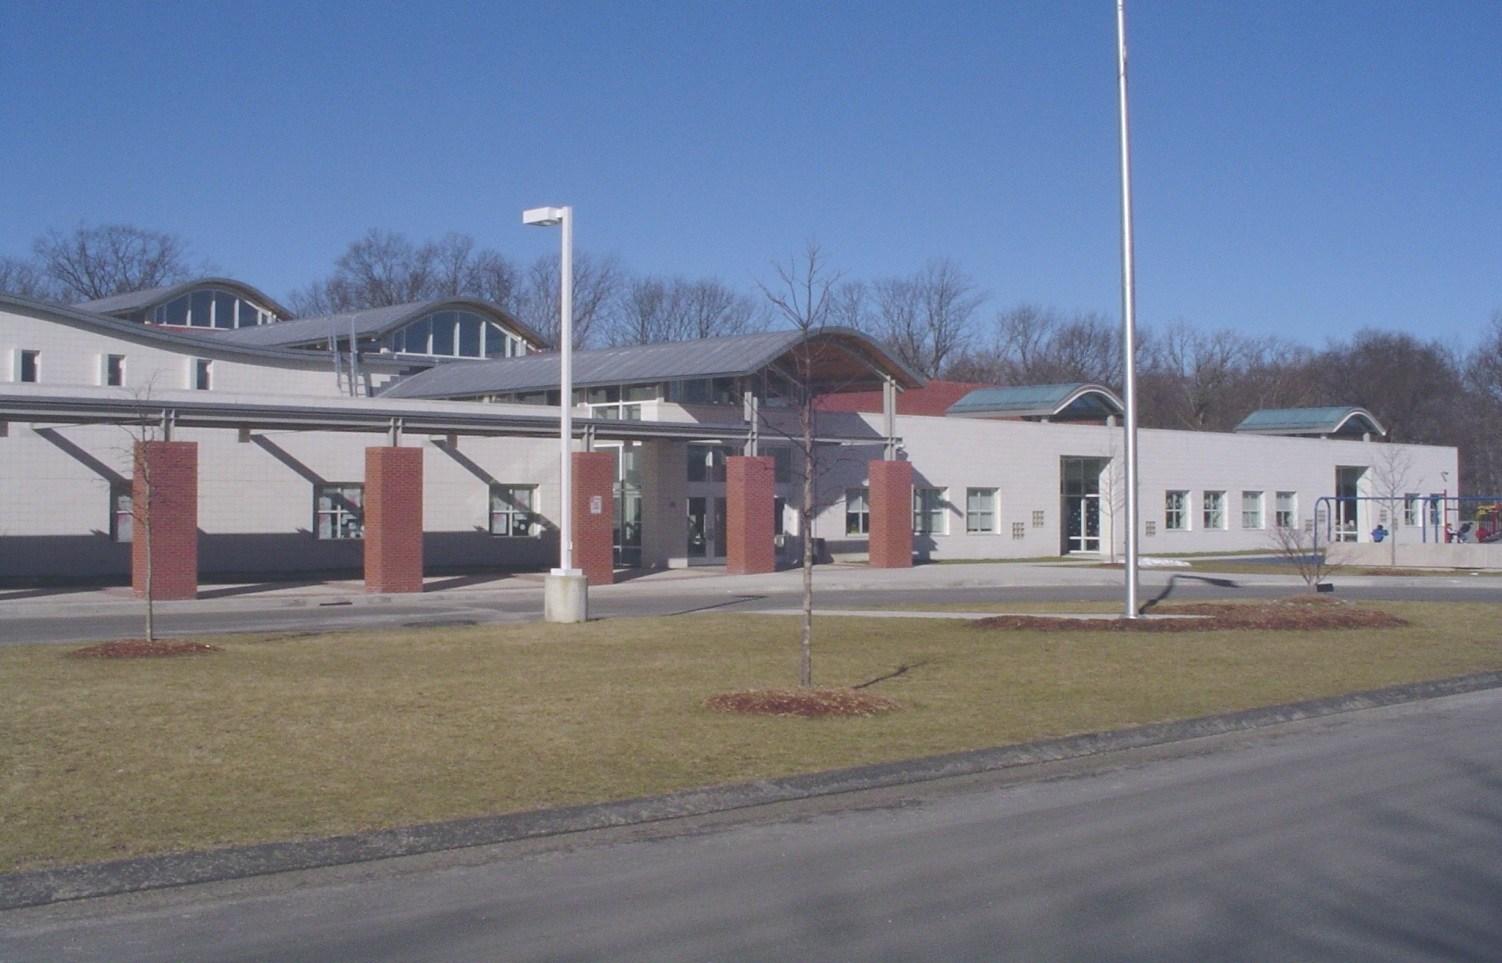 McKinley Elementary School will be closed on Wednesday. (Fairfield Public Schools)